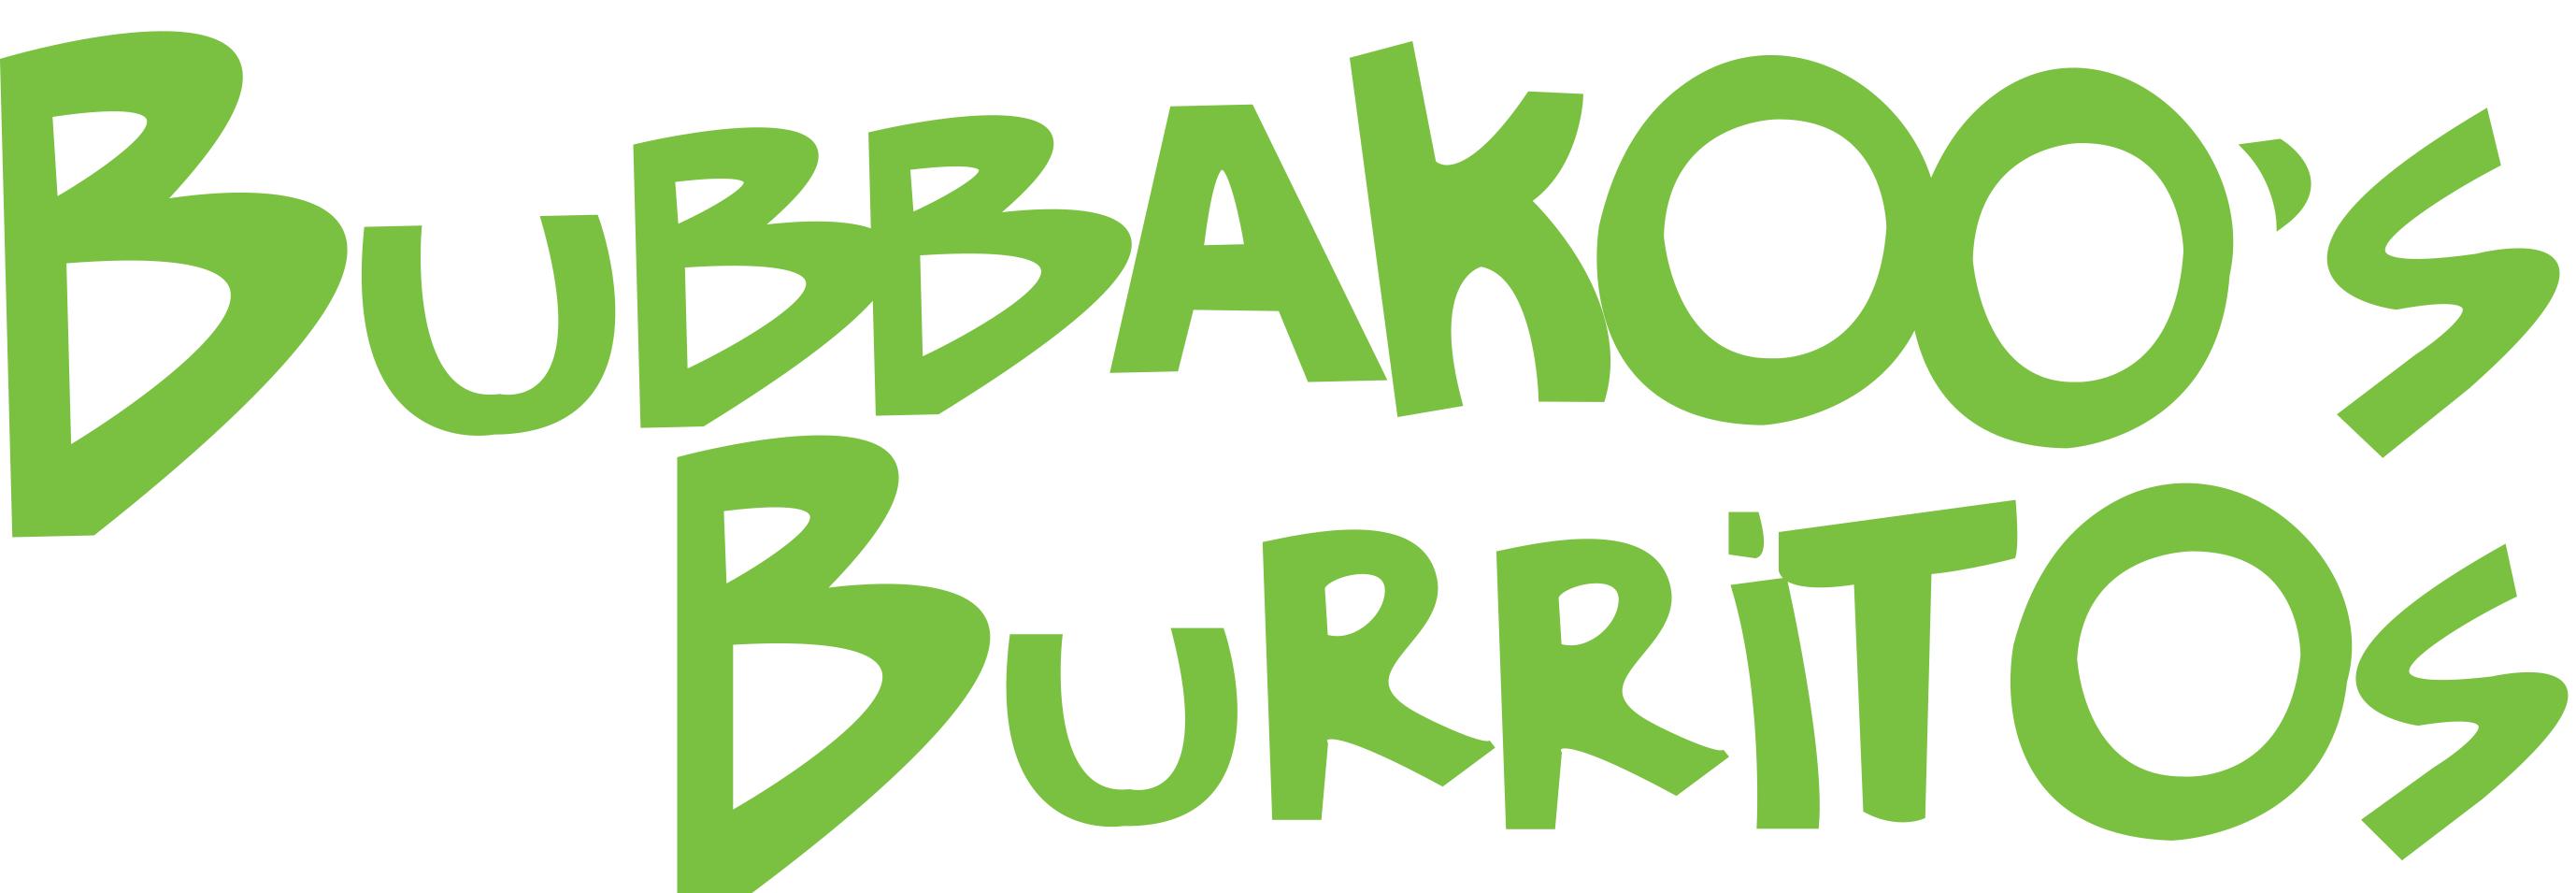 BubbakoosBurritos_ResortsAC